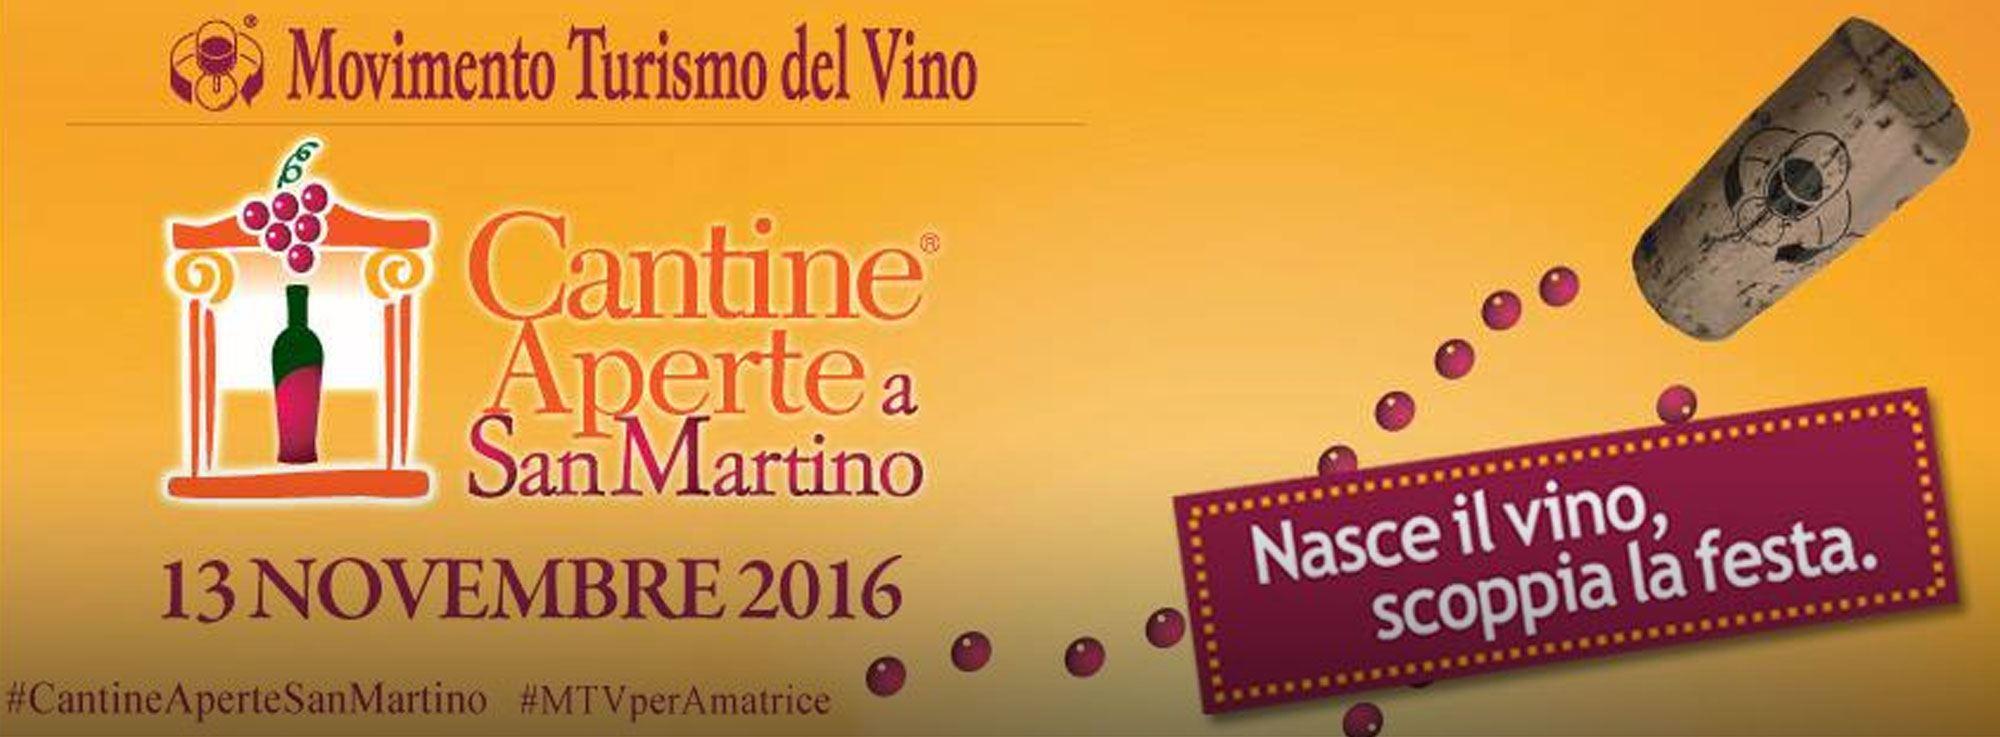 San Martino: Cantine Aperte